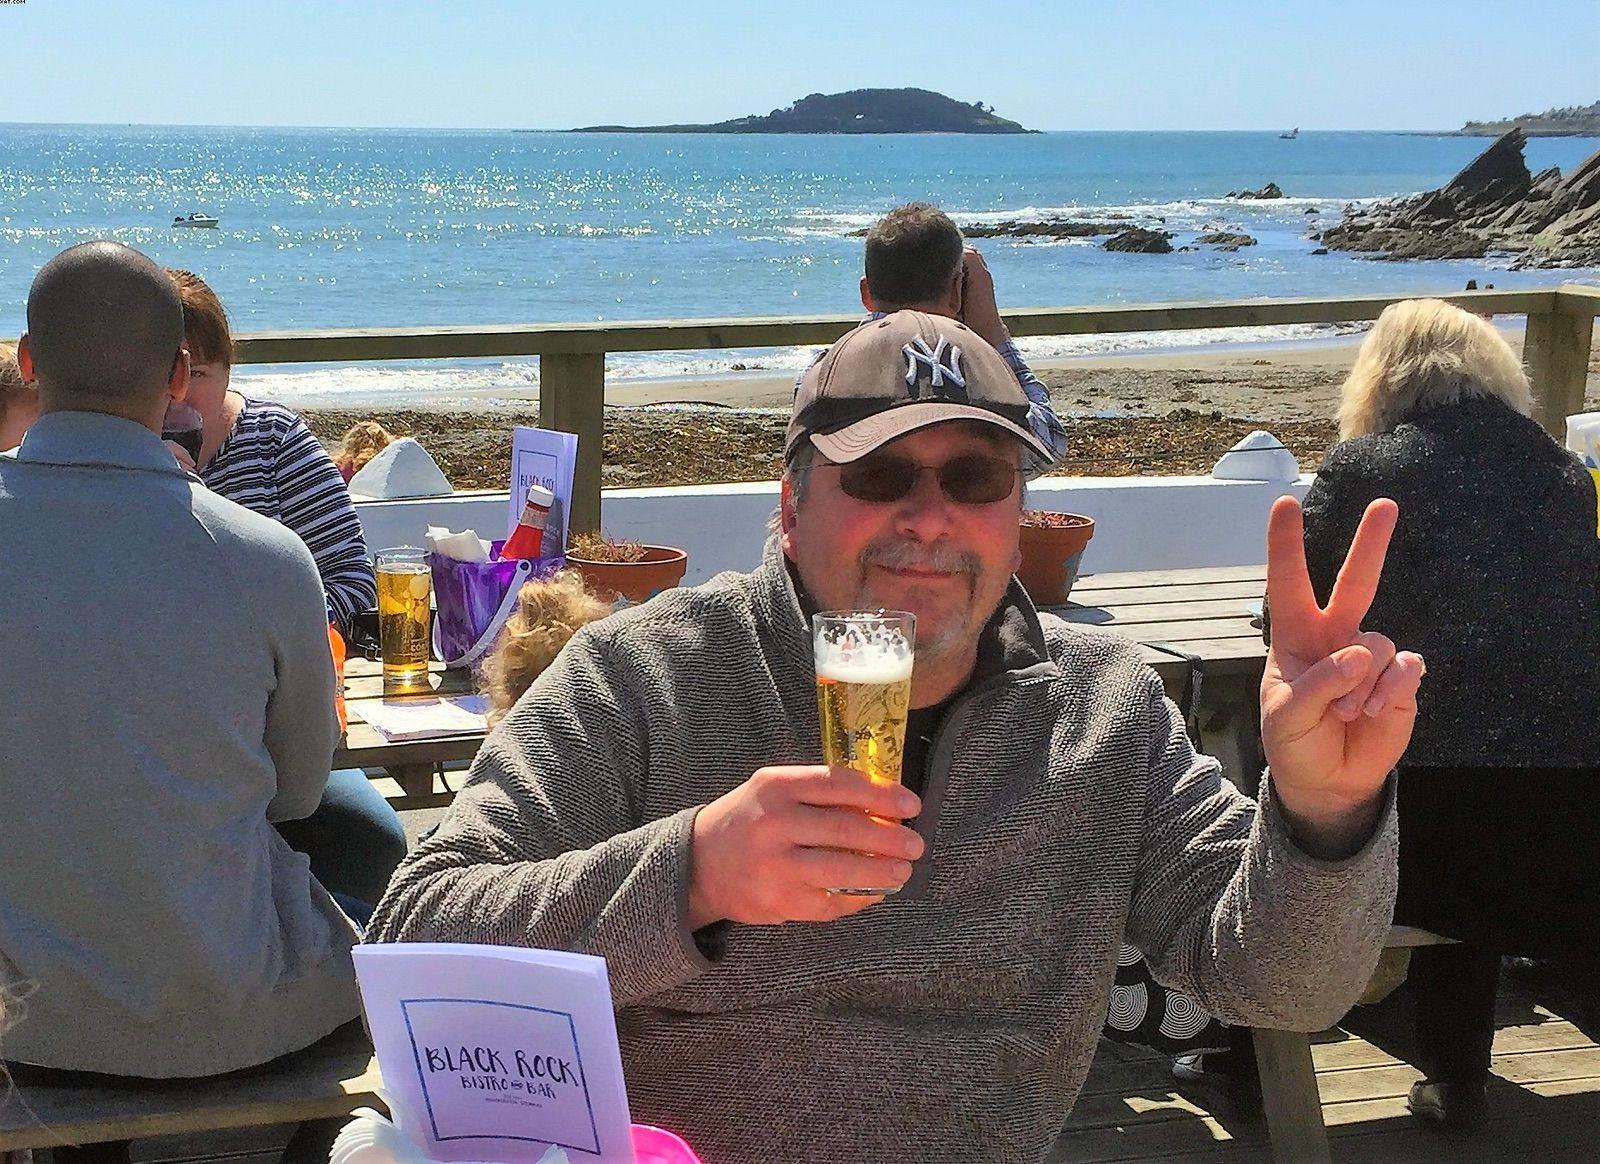 Man enjoying a pint by the sea at Black Rock Cafe near Looe Cornwall